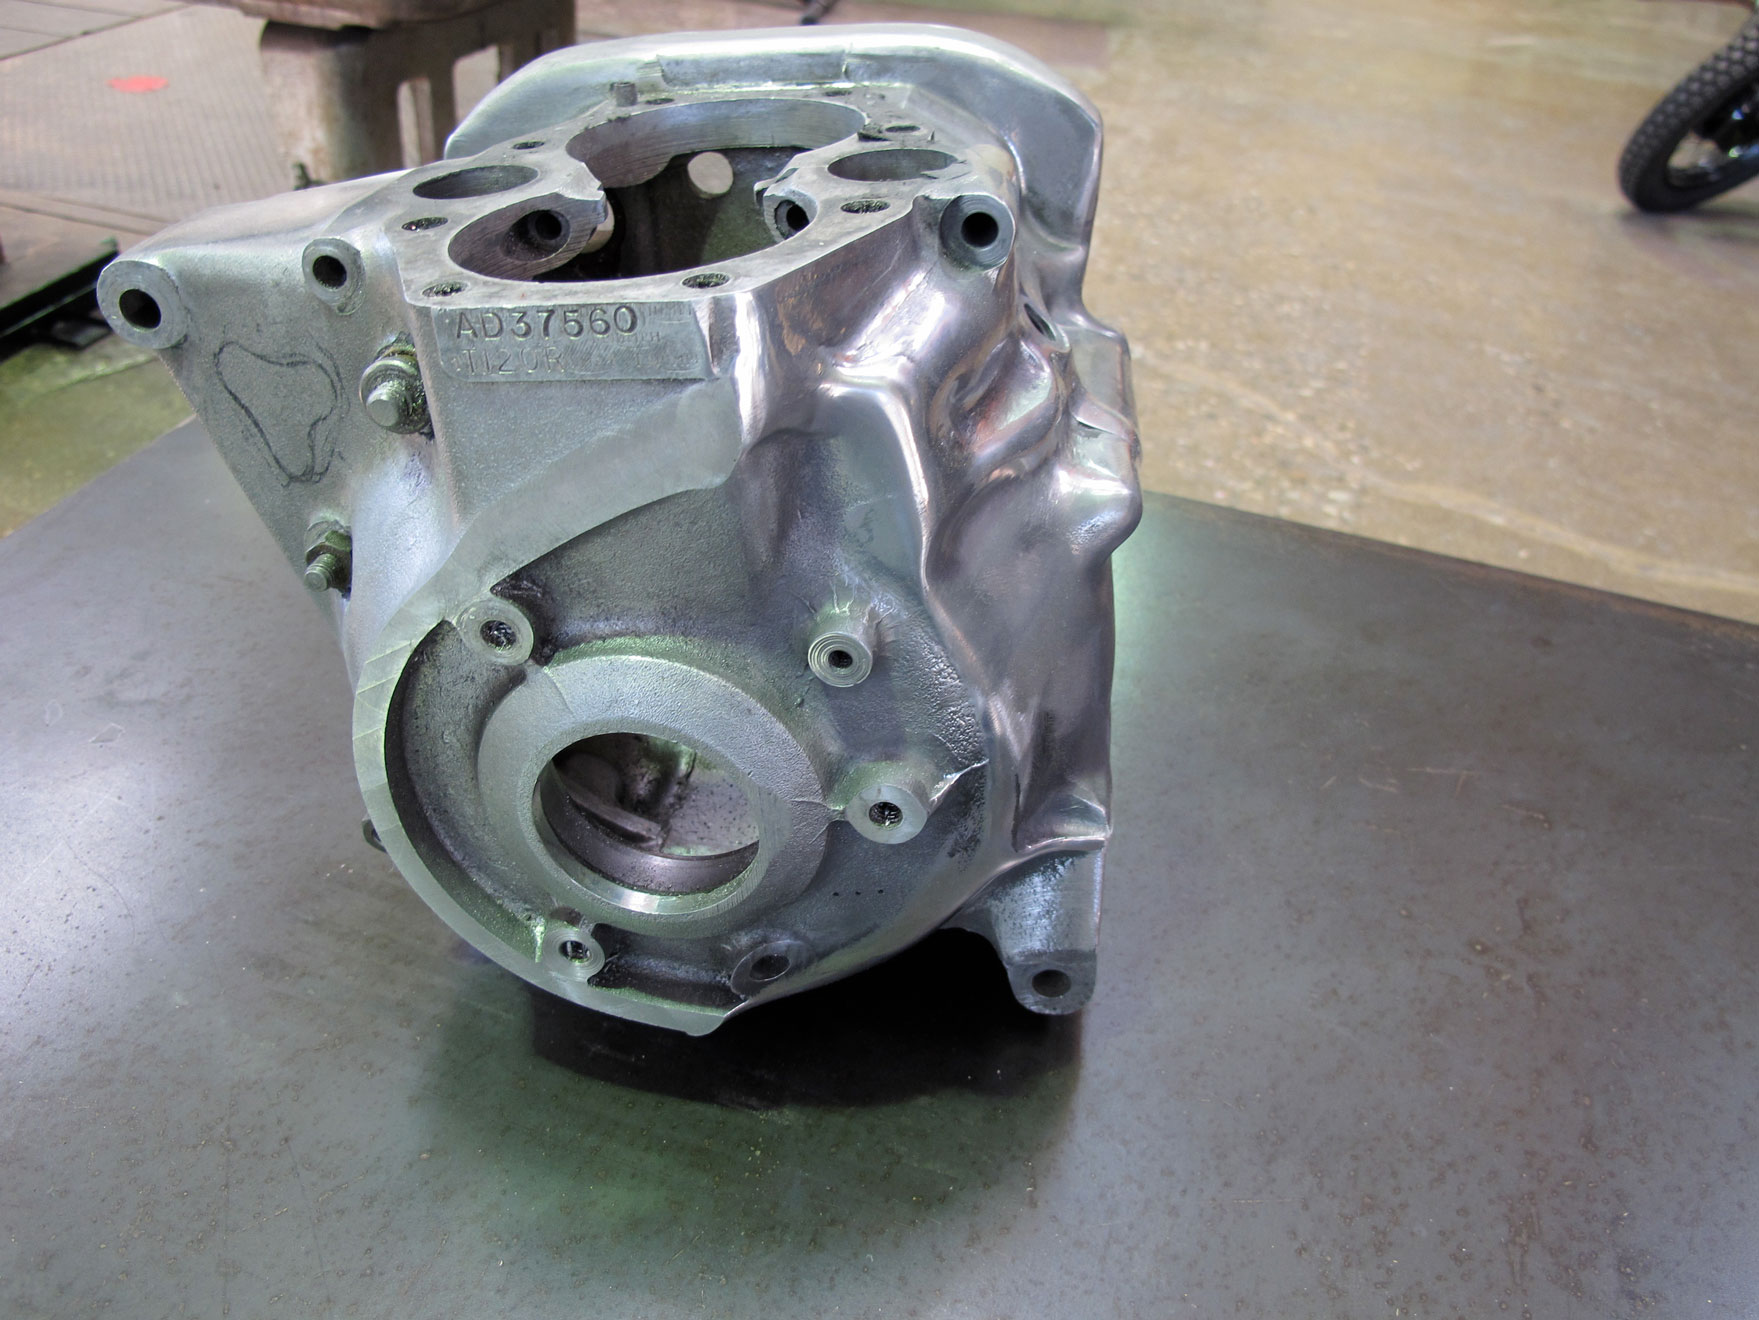 Kestrel-Engine-Crank.jpg